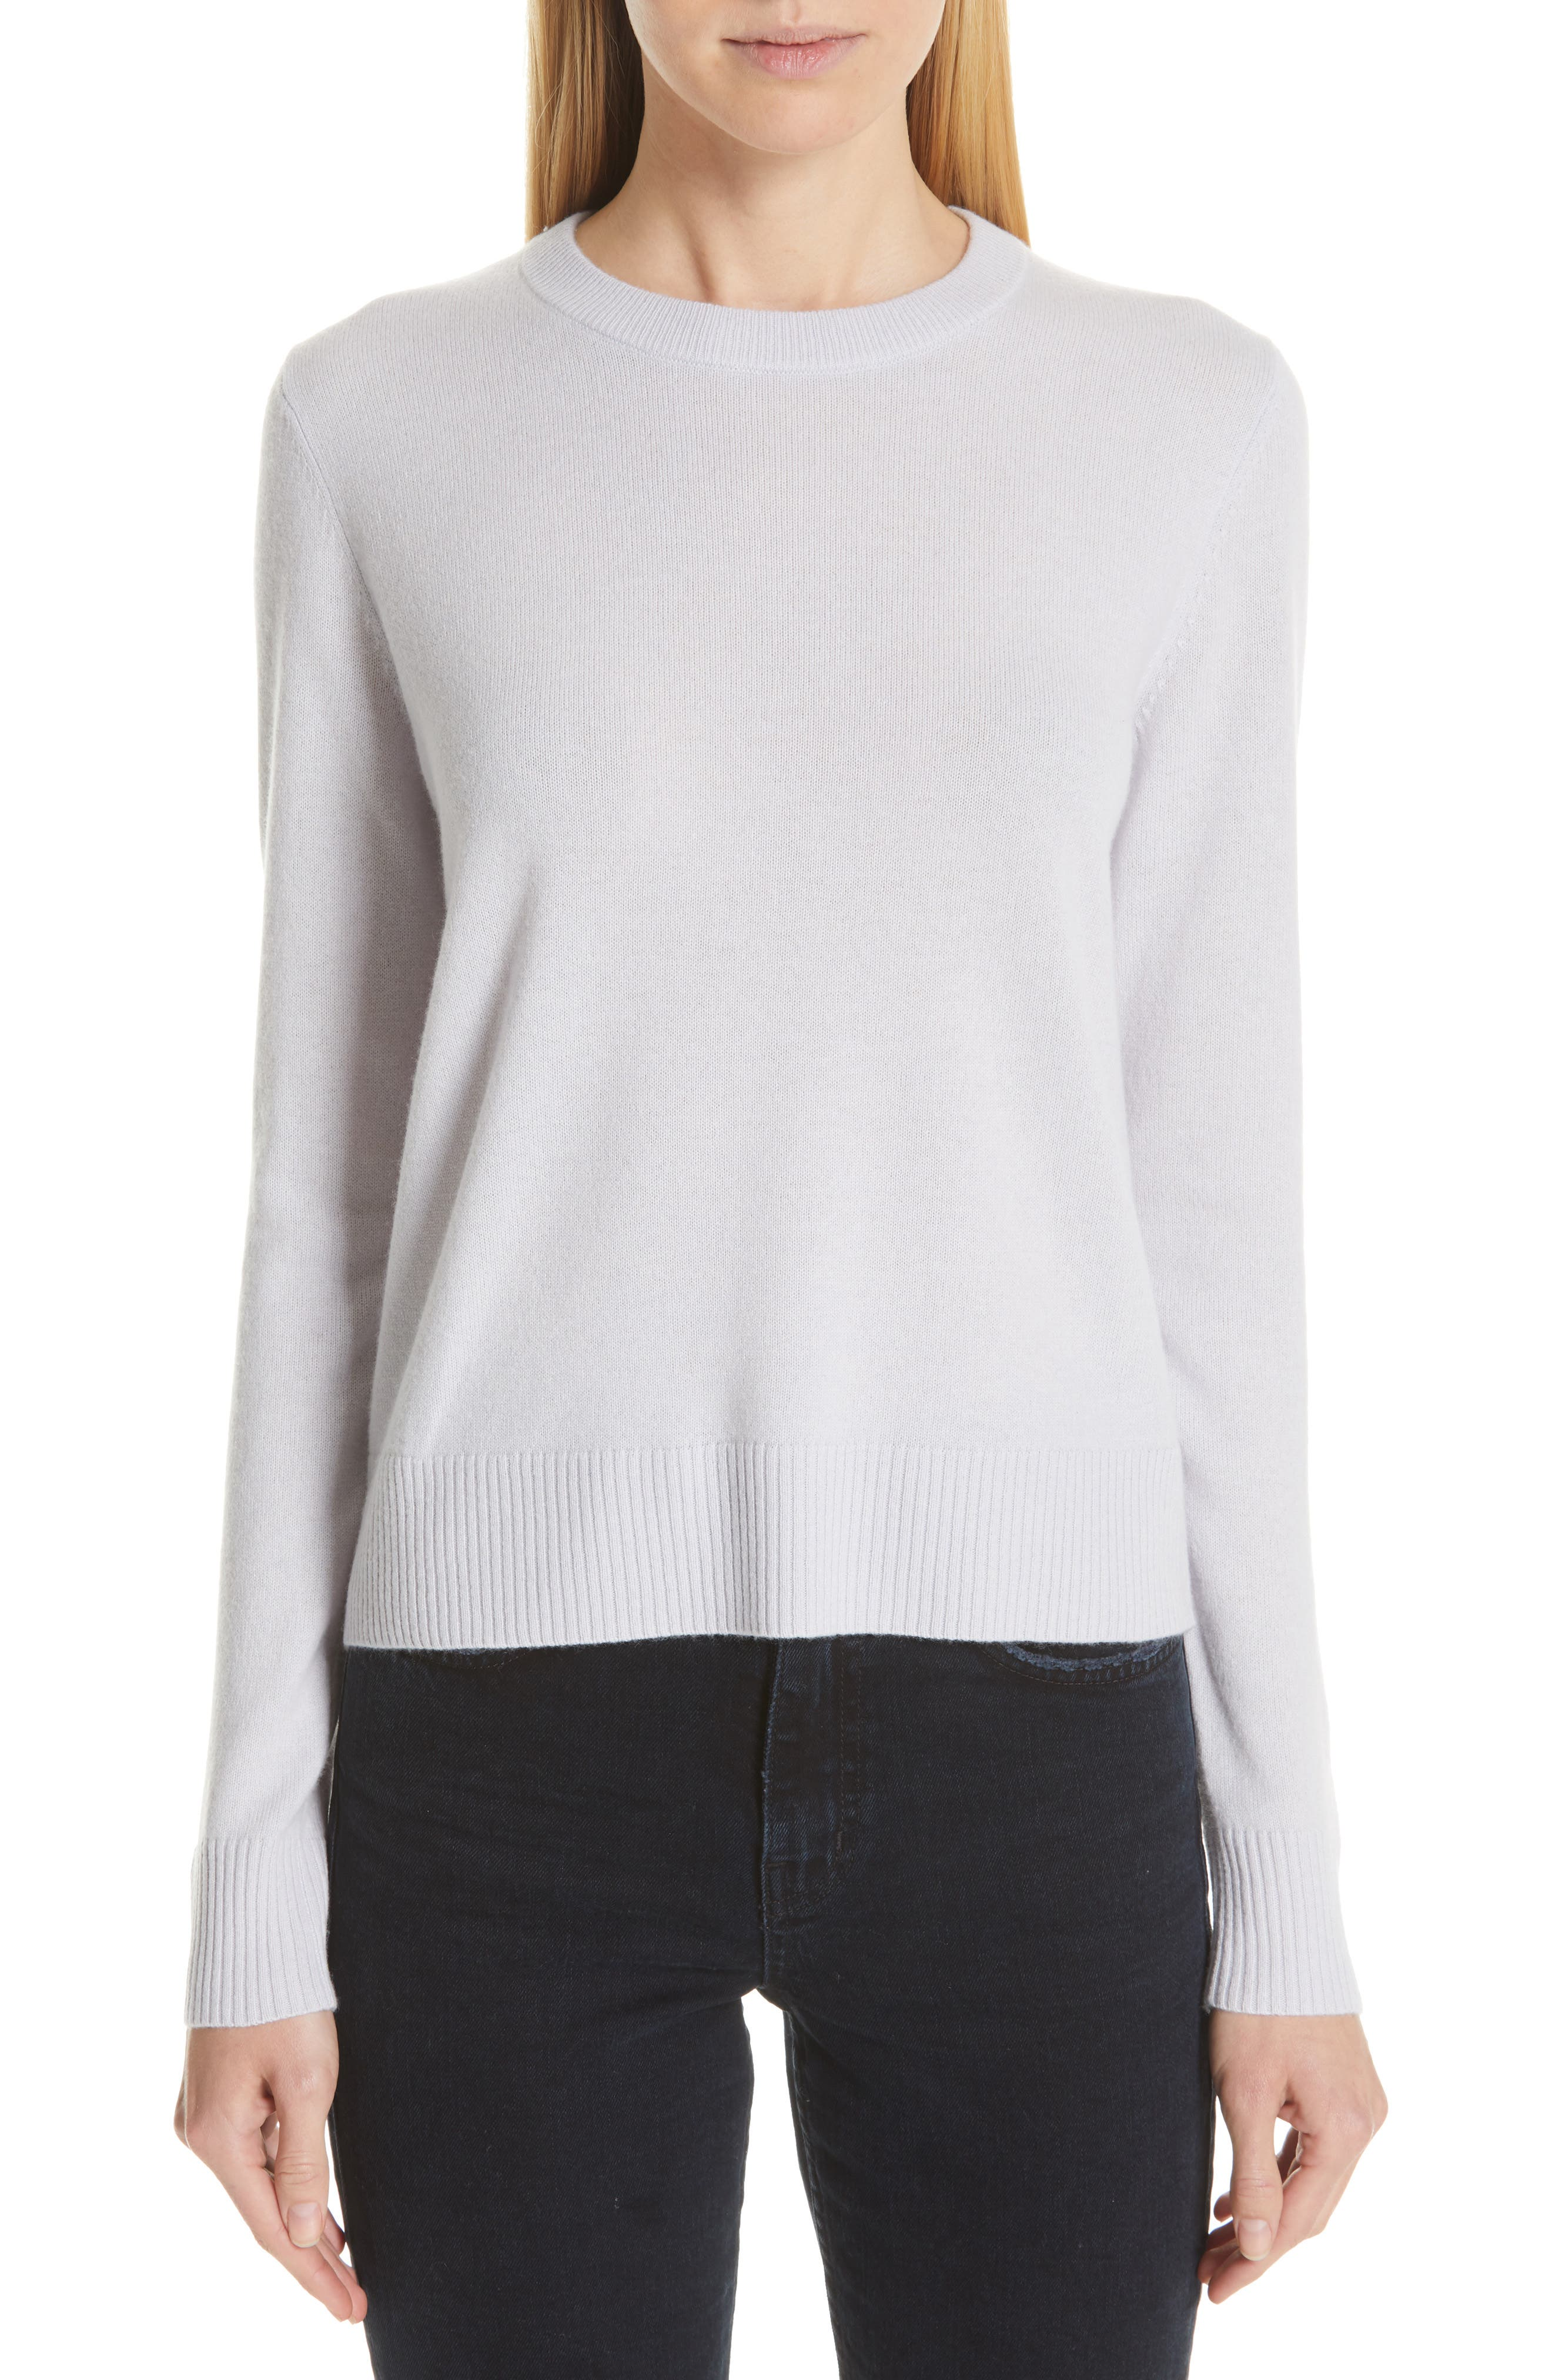 PROENZA SCHOULER Cashmere Sweater, Main, color, BLUE GREY